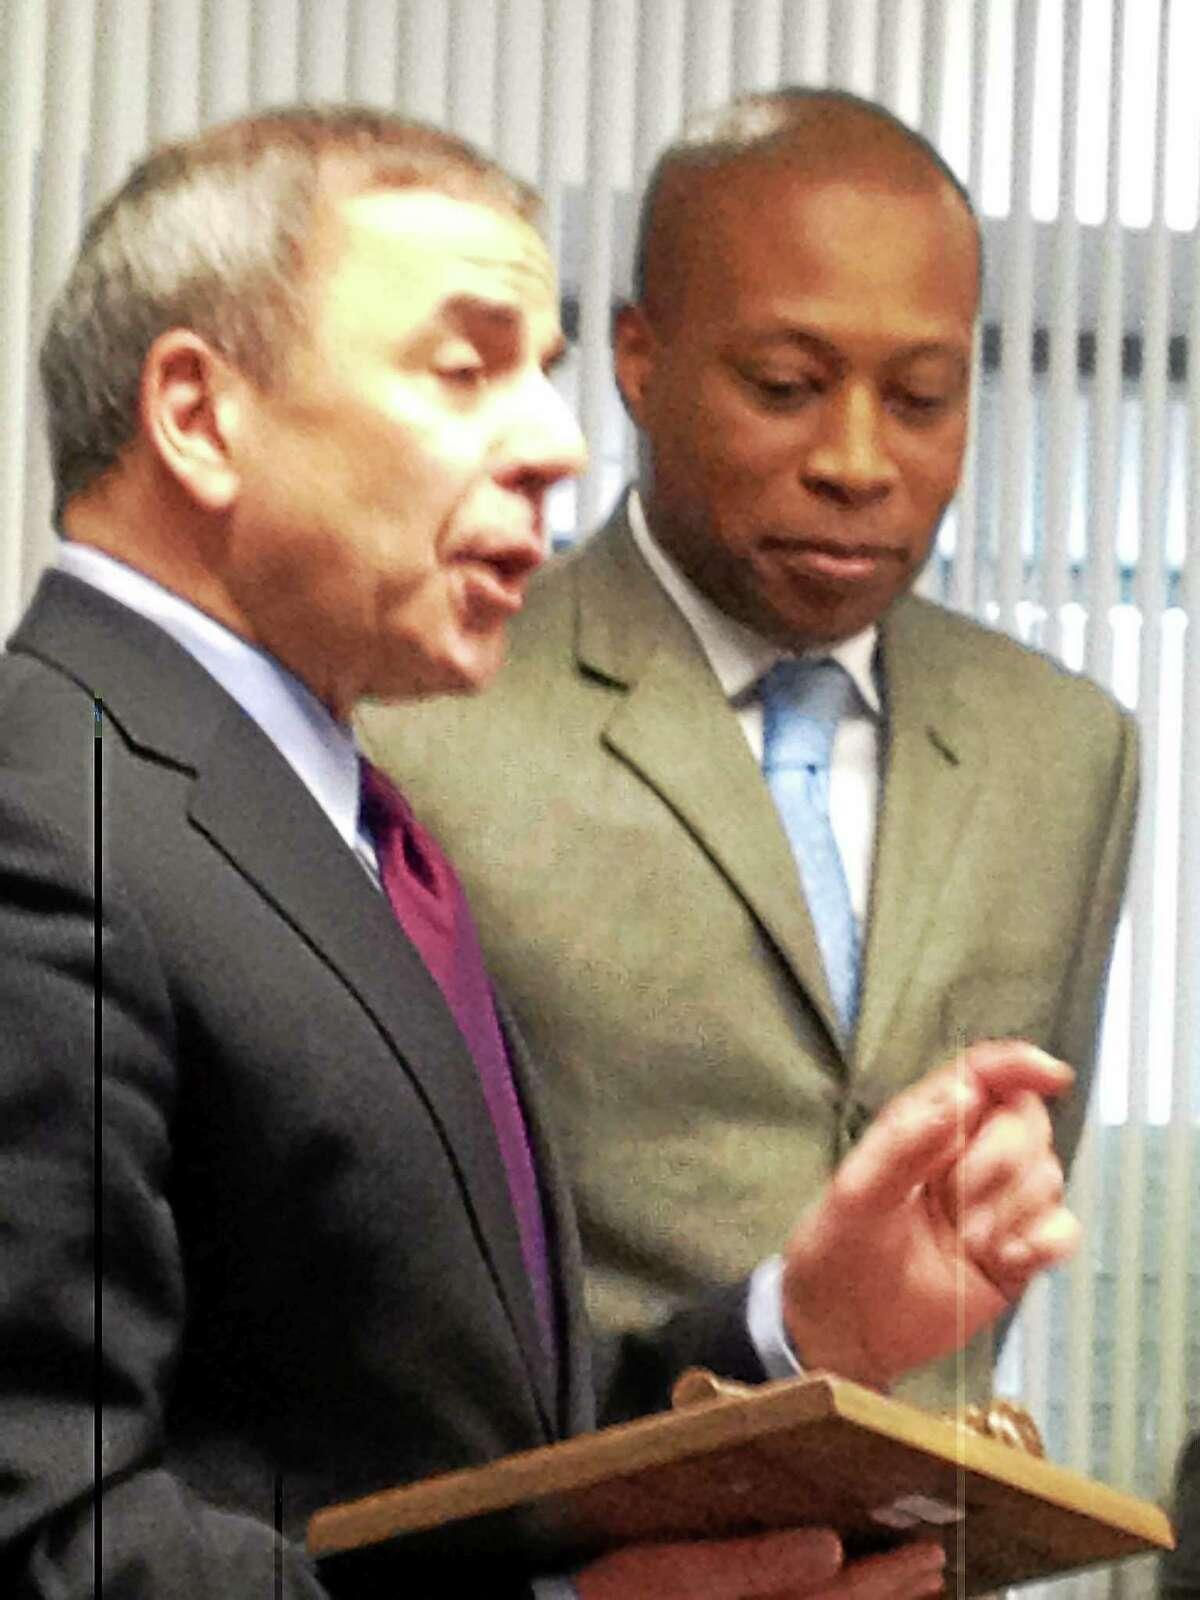 North Haven First Selectman Michael Freda (left) and Hamden Mayor Scott Jackson